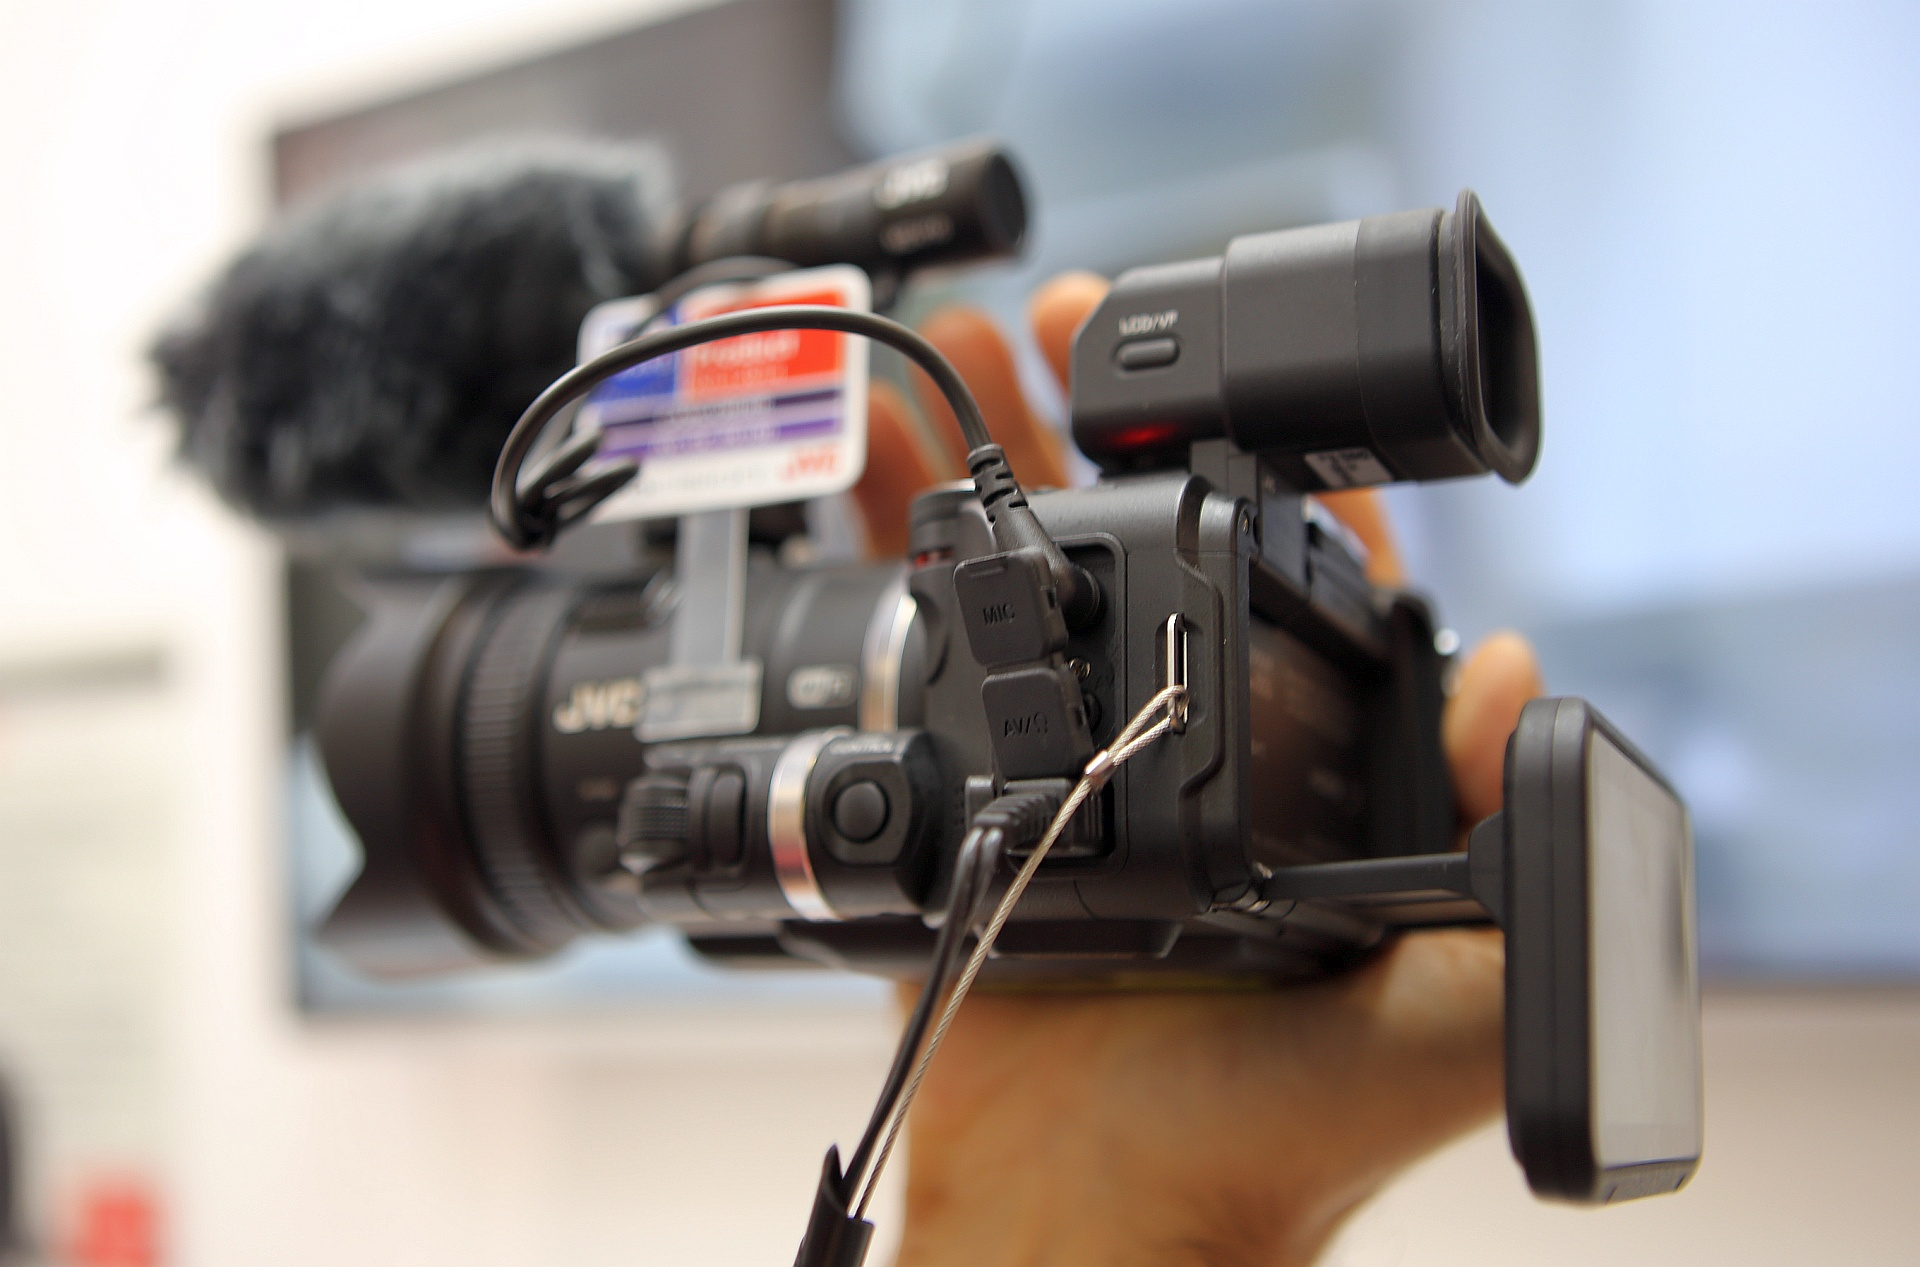 JVC GC-PX100 – O camera video mica, dar performanta, la IFA 2013